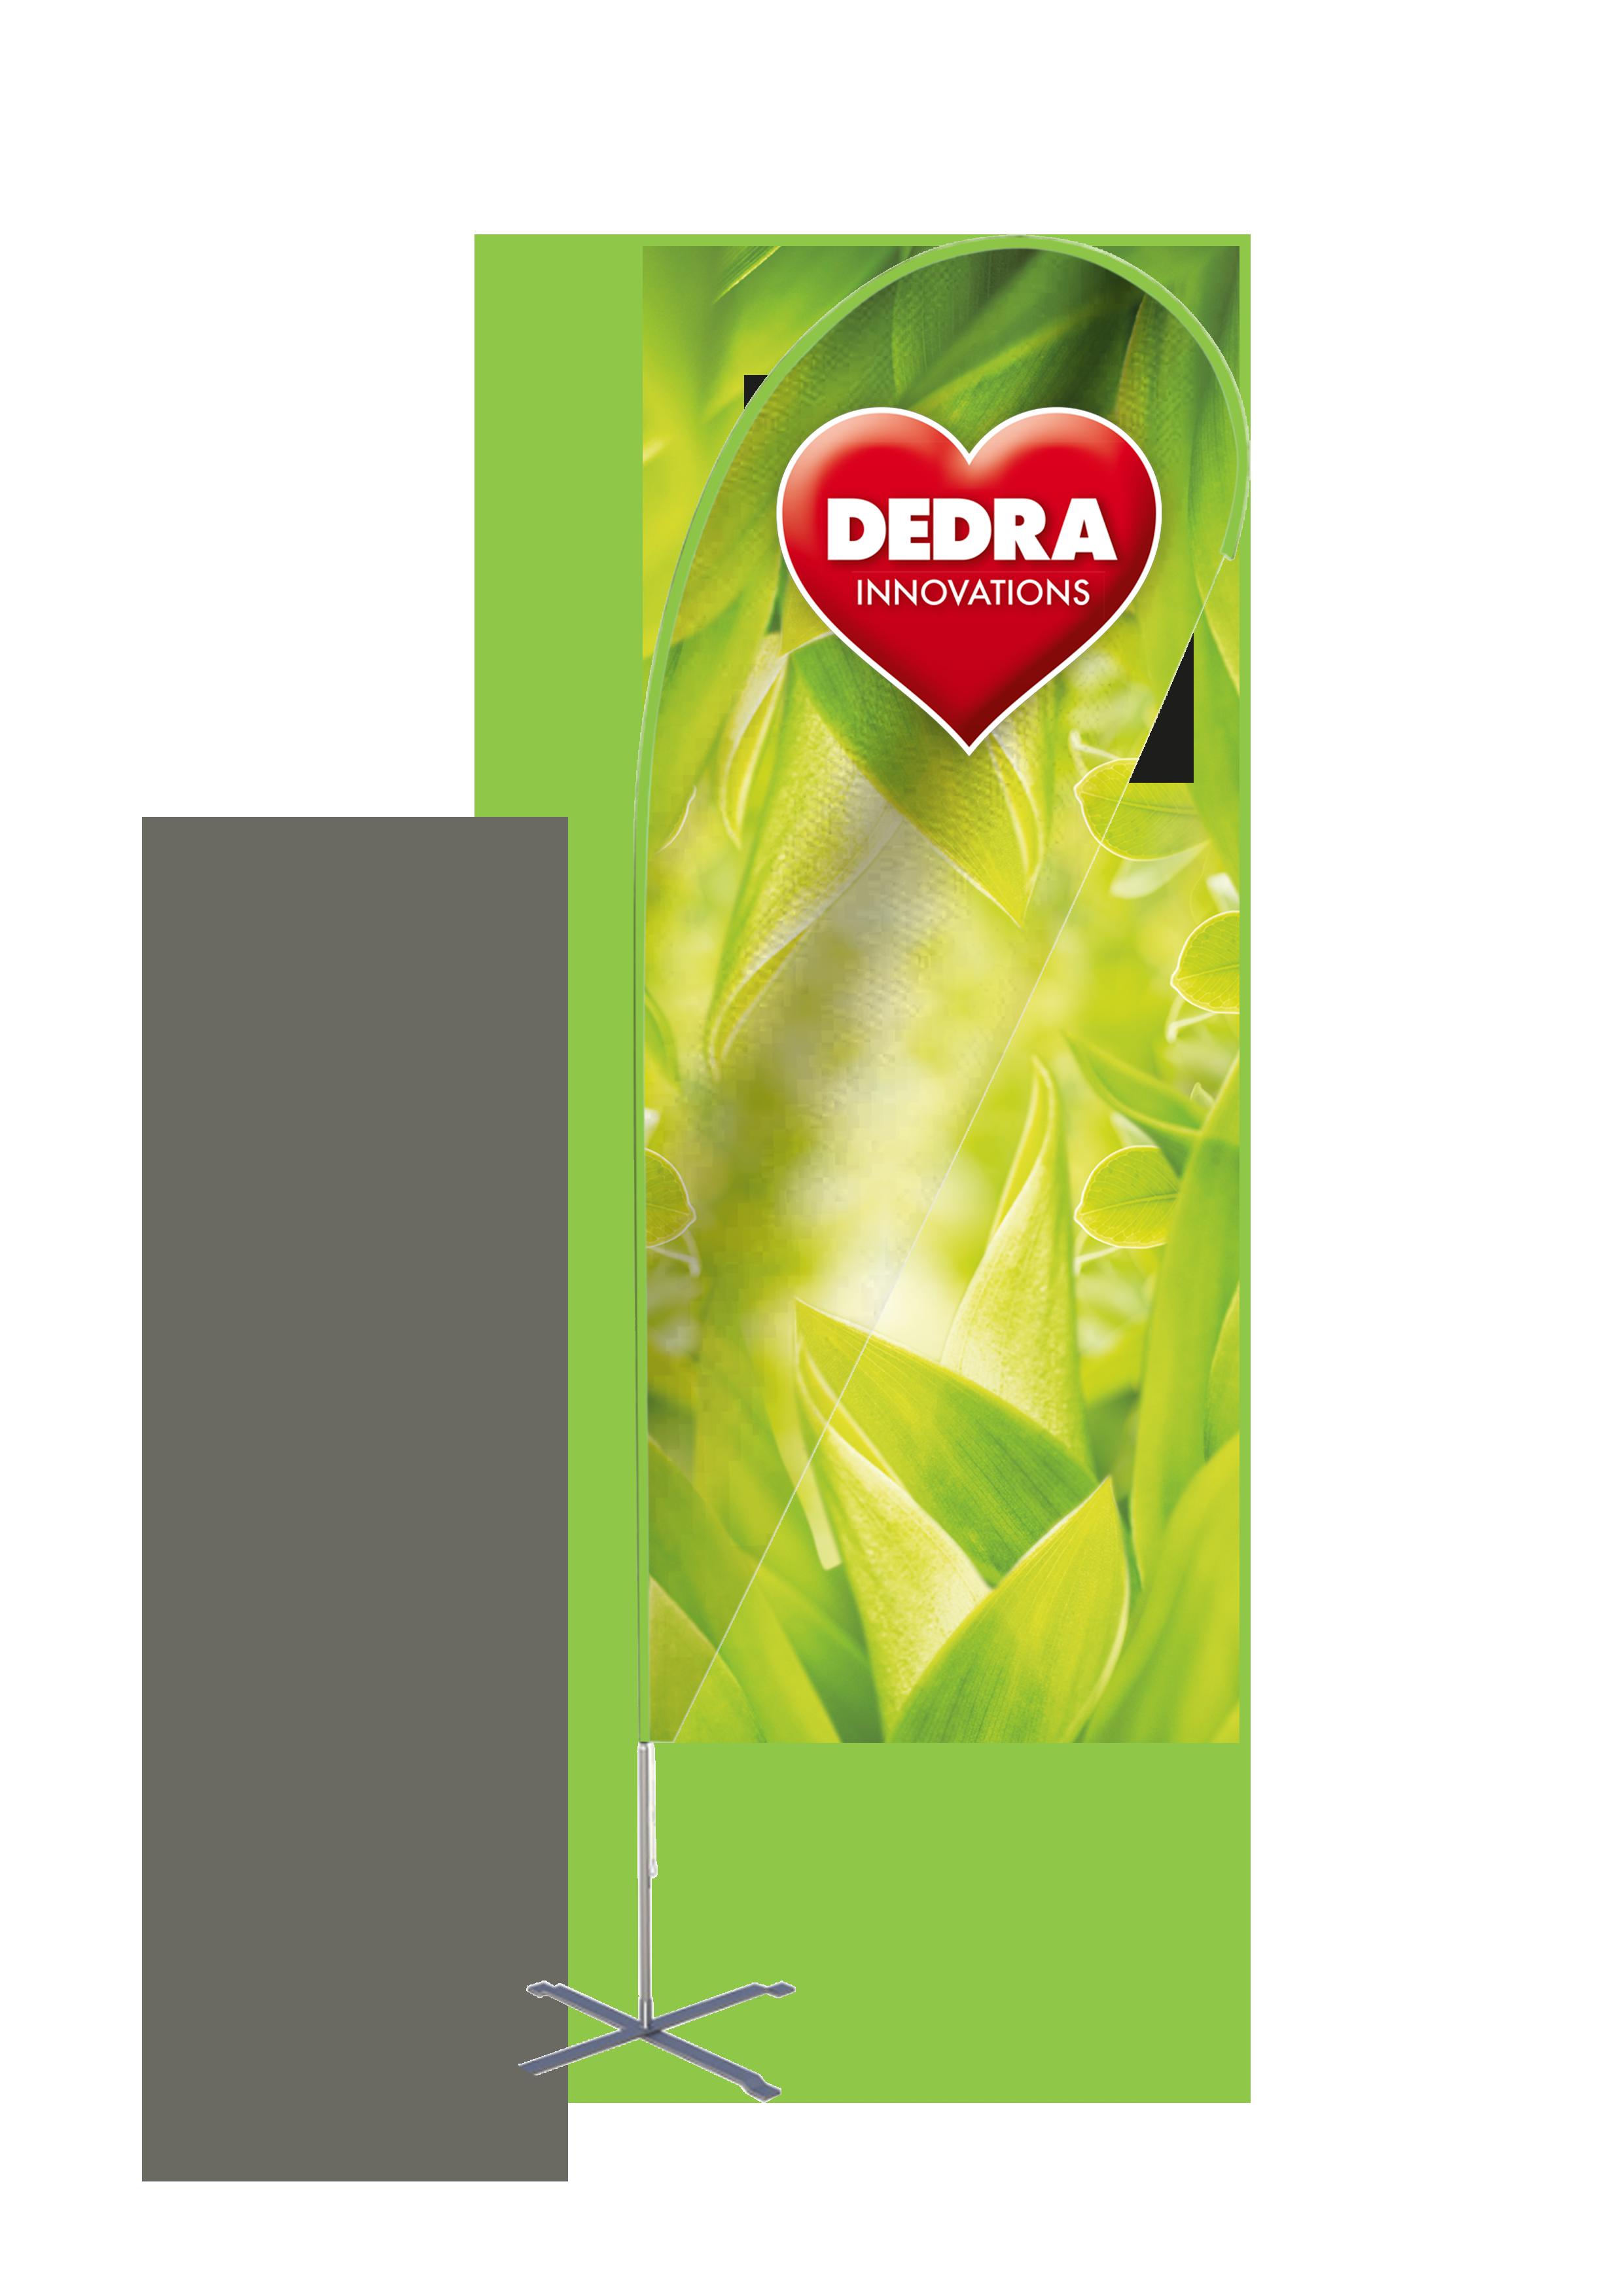 Reklamní vlajka, DEDRA